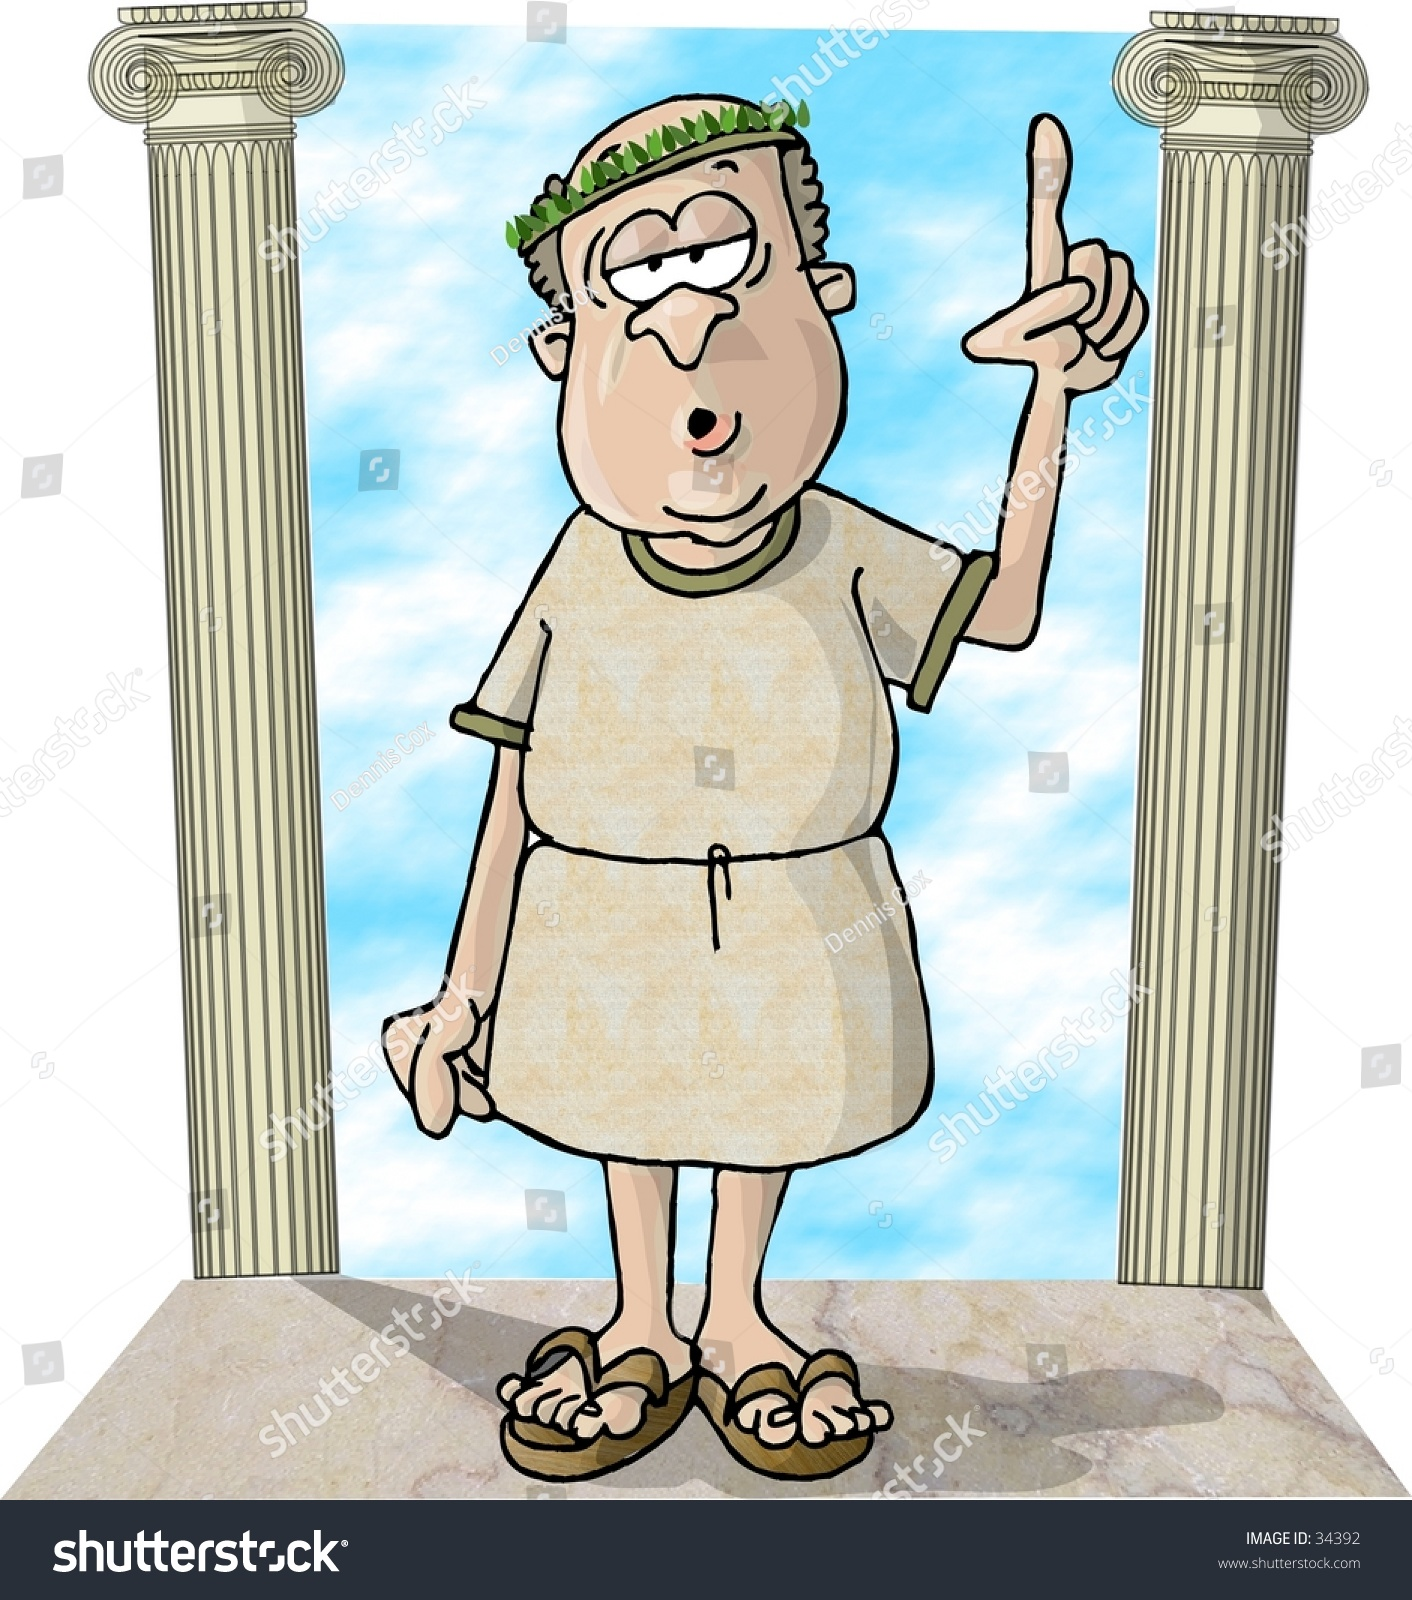 Clipart Illustration Roman Guy Between 2 Stockillustration ...